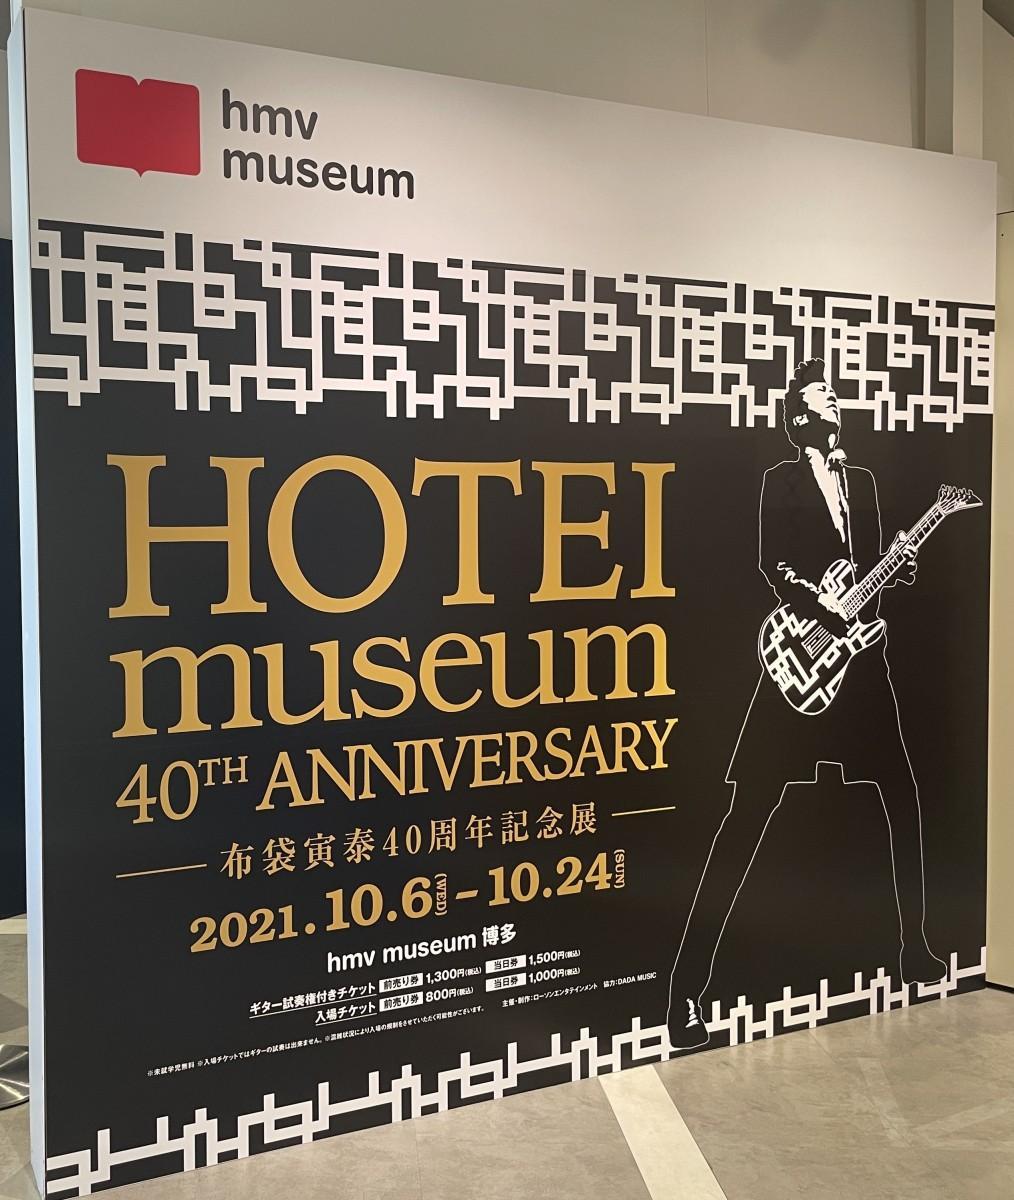 「HOTEI museum 40th ANNIVERSARY-布袋寅泰40周年記念展-」会場の様子